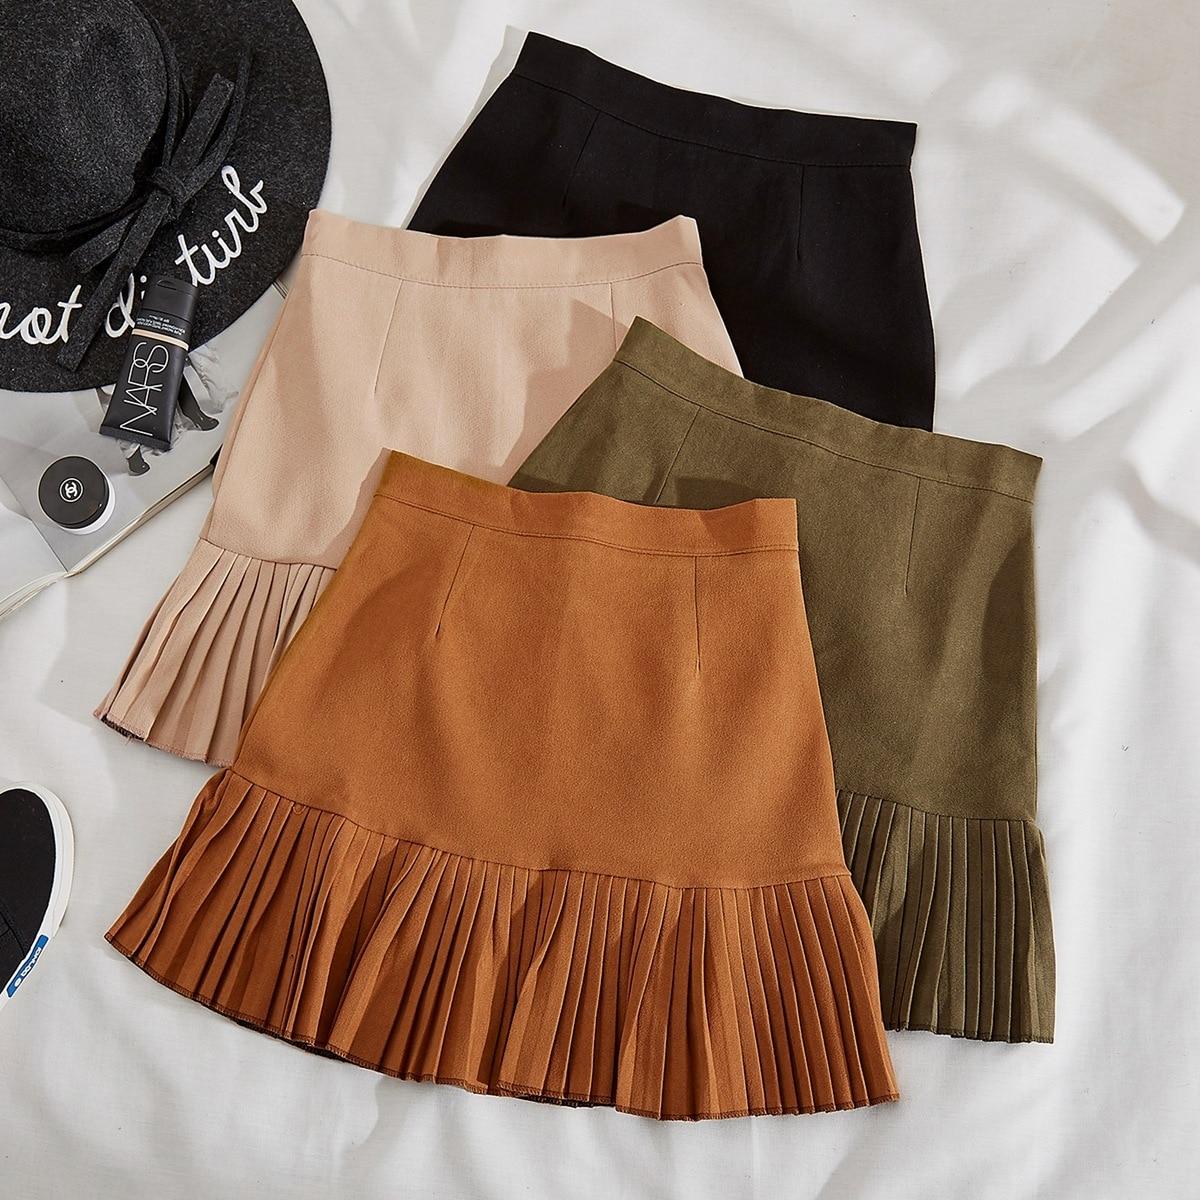 Beautiful Clothing 2018 Spring East Gate Imitate Chamois Down High Waist Short Skirt A Word Skirt Bouffancy Half-body Skirt